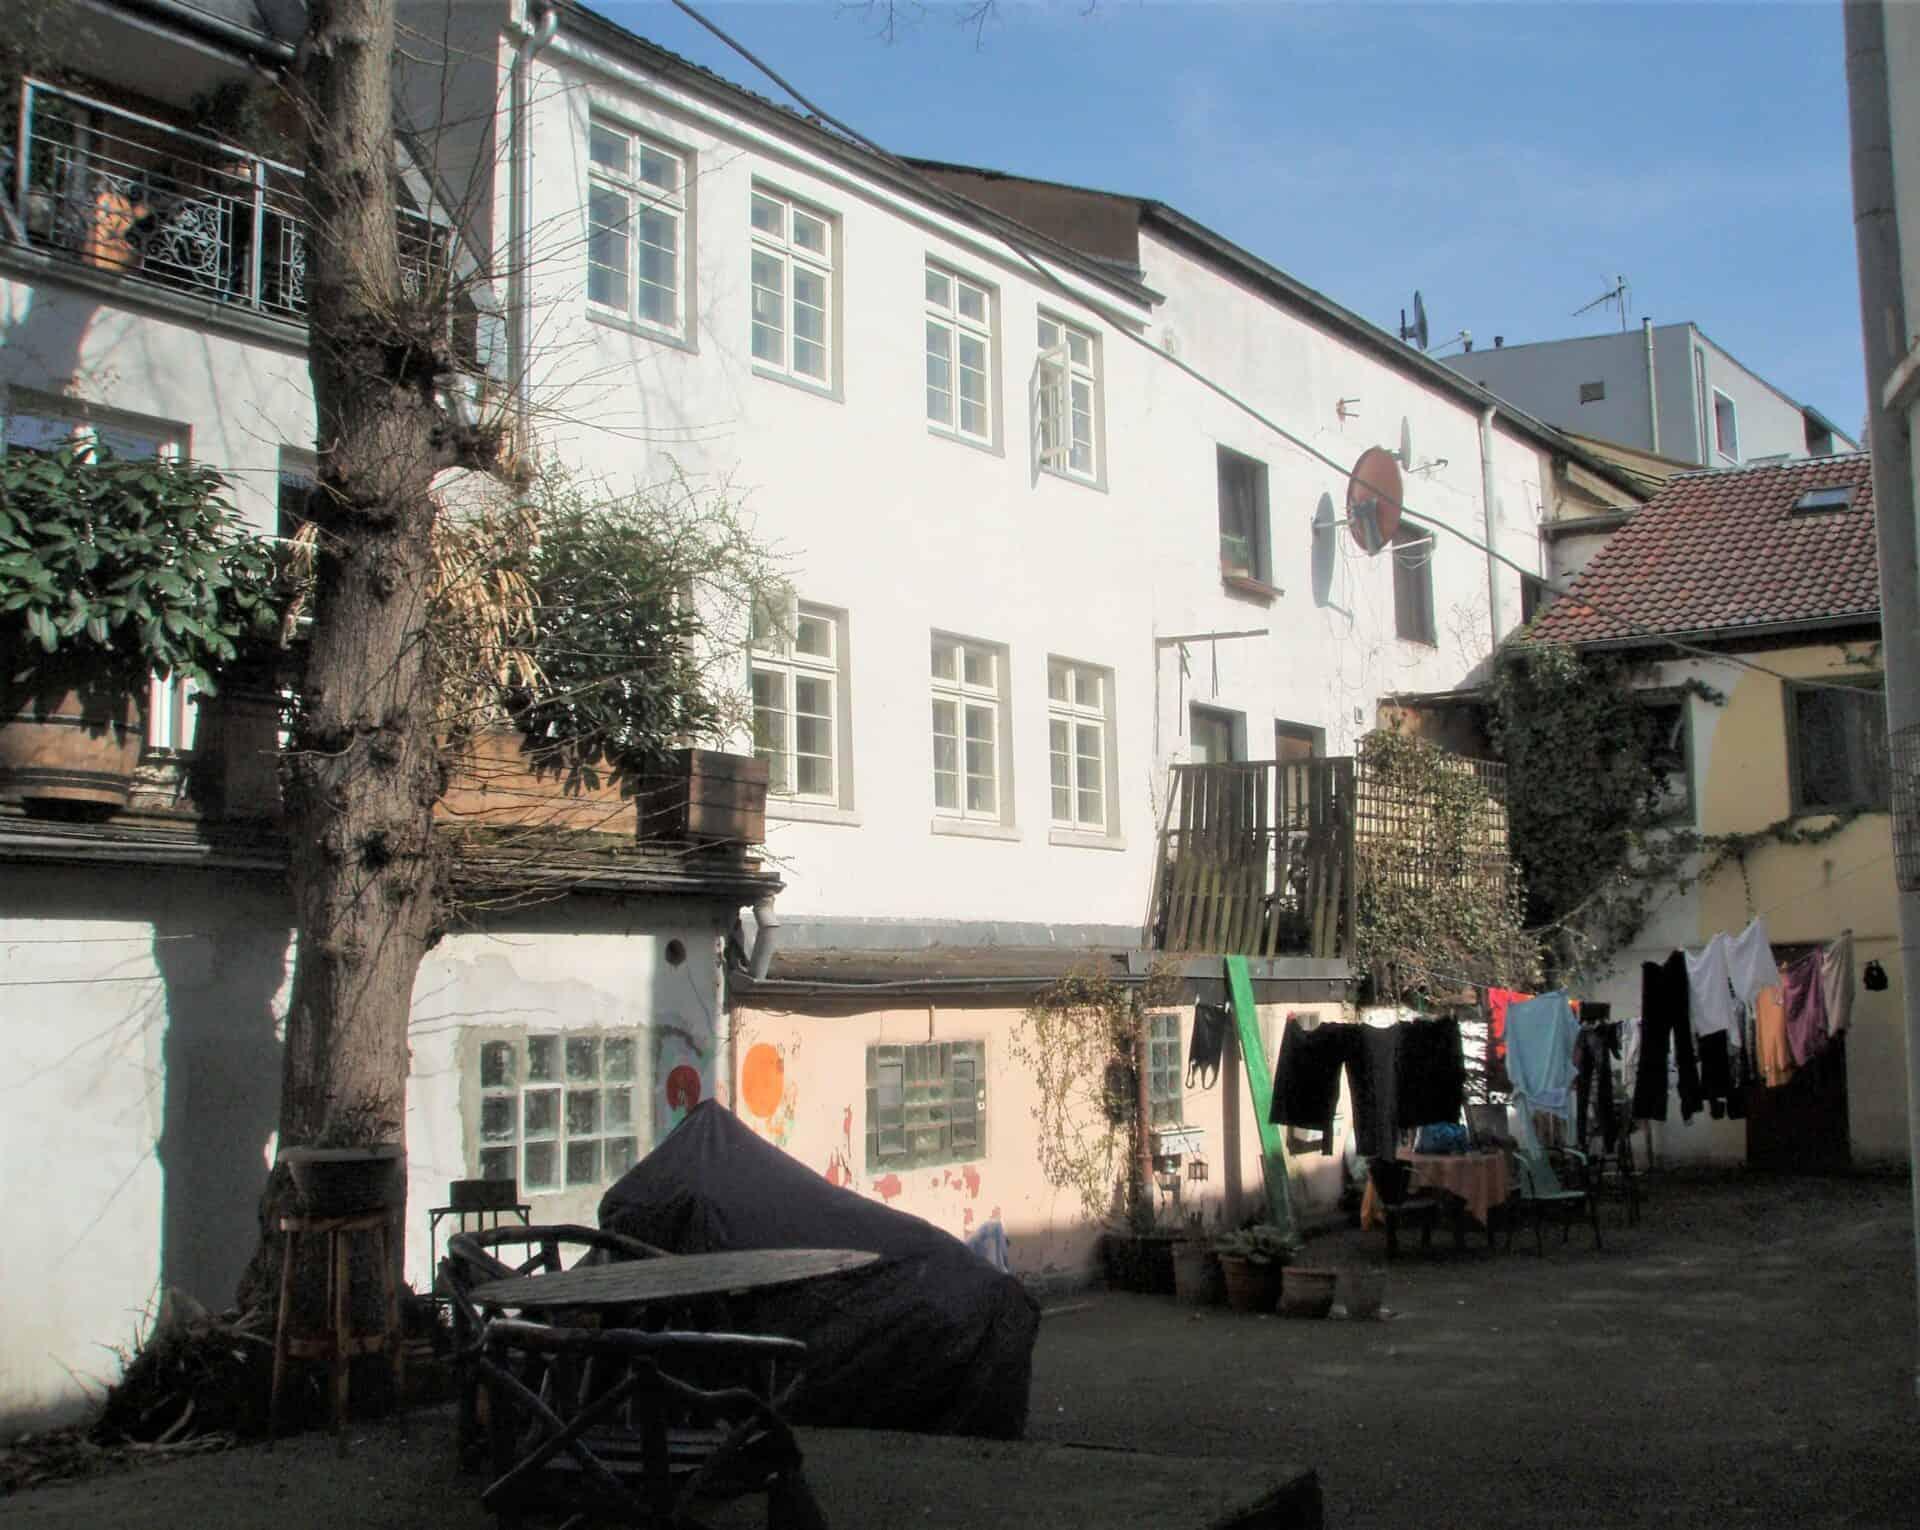 St. Pauli Hinterhof - Foto: Hartmut Roderfeld